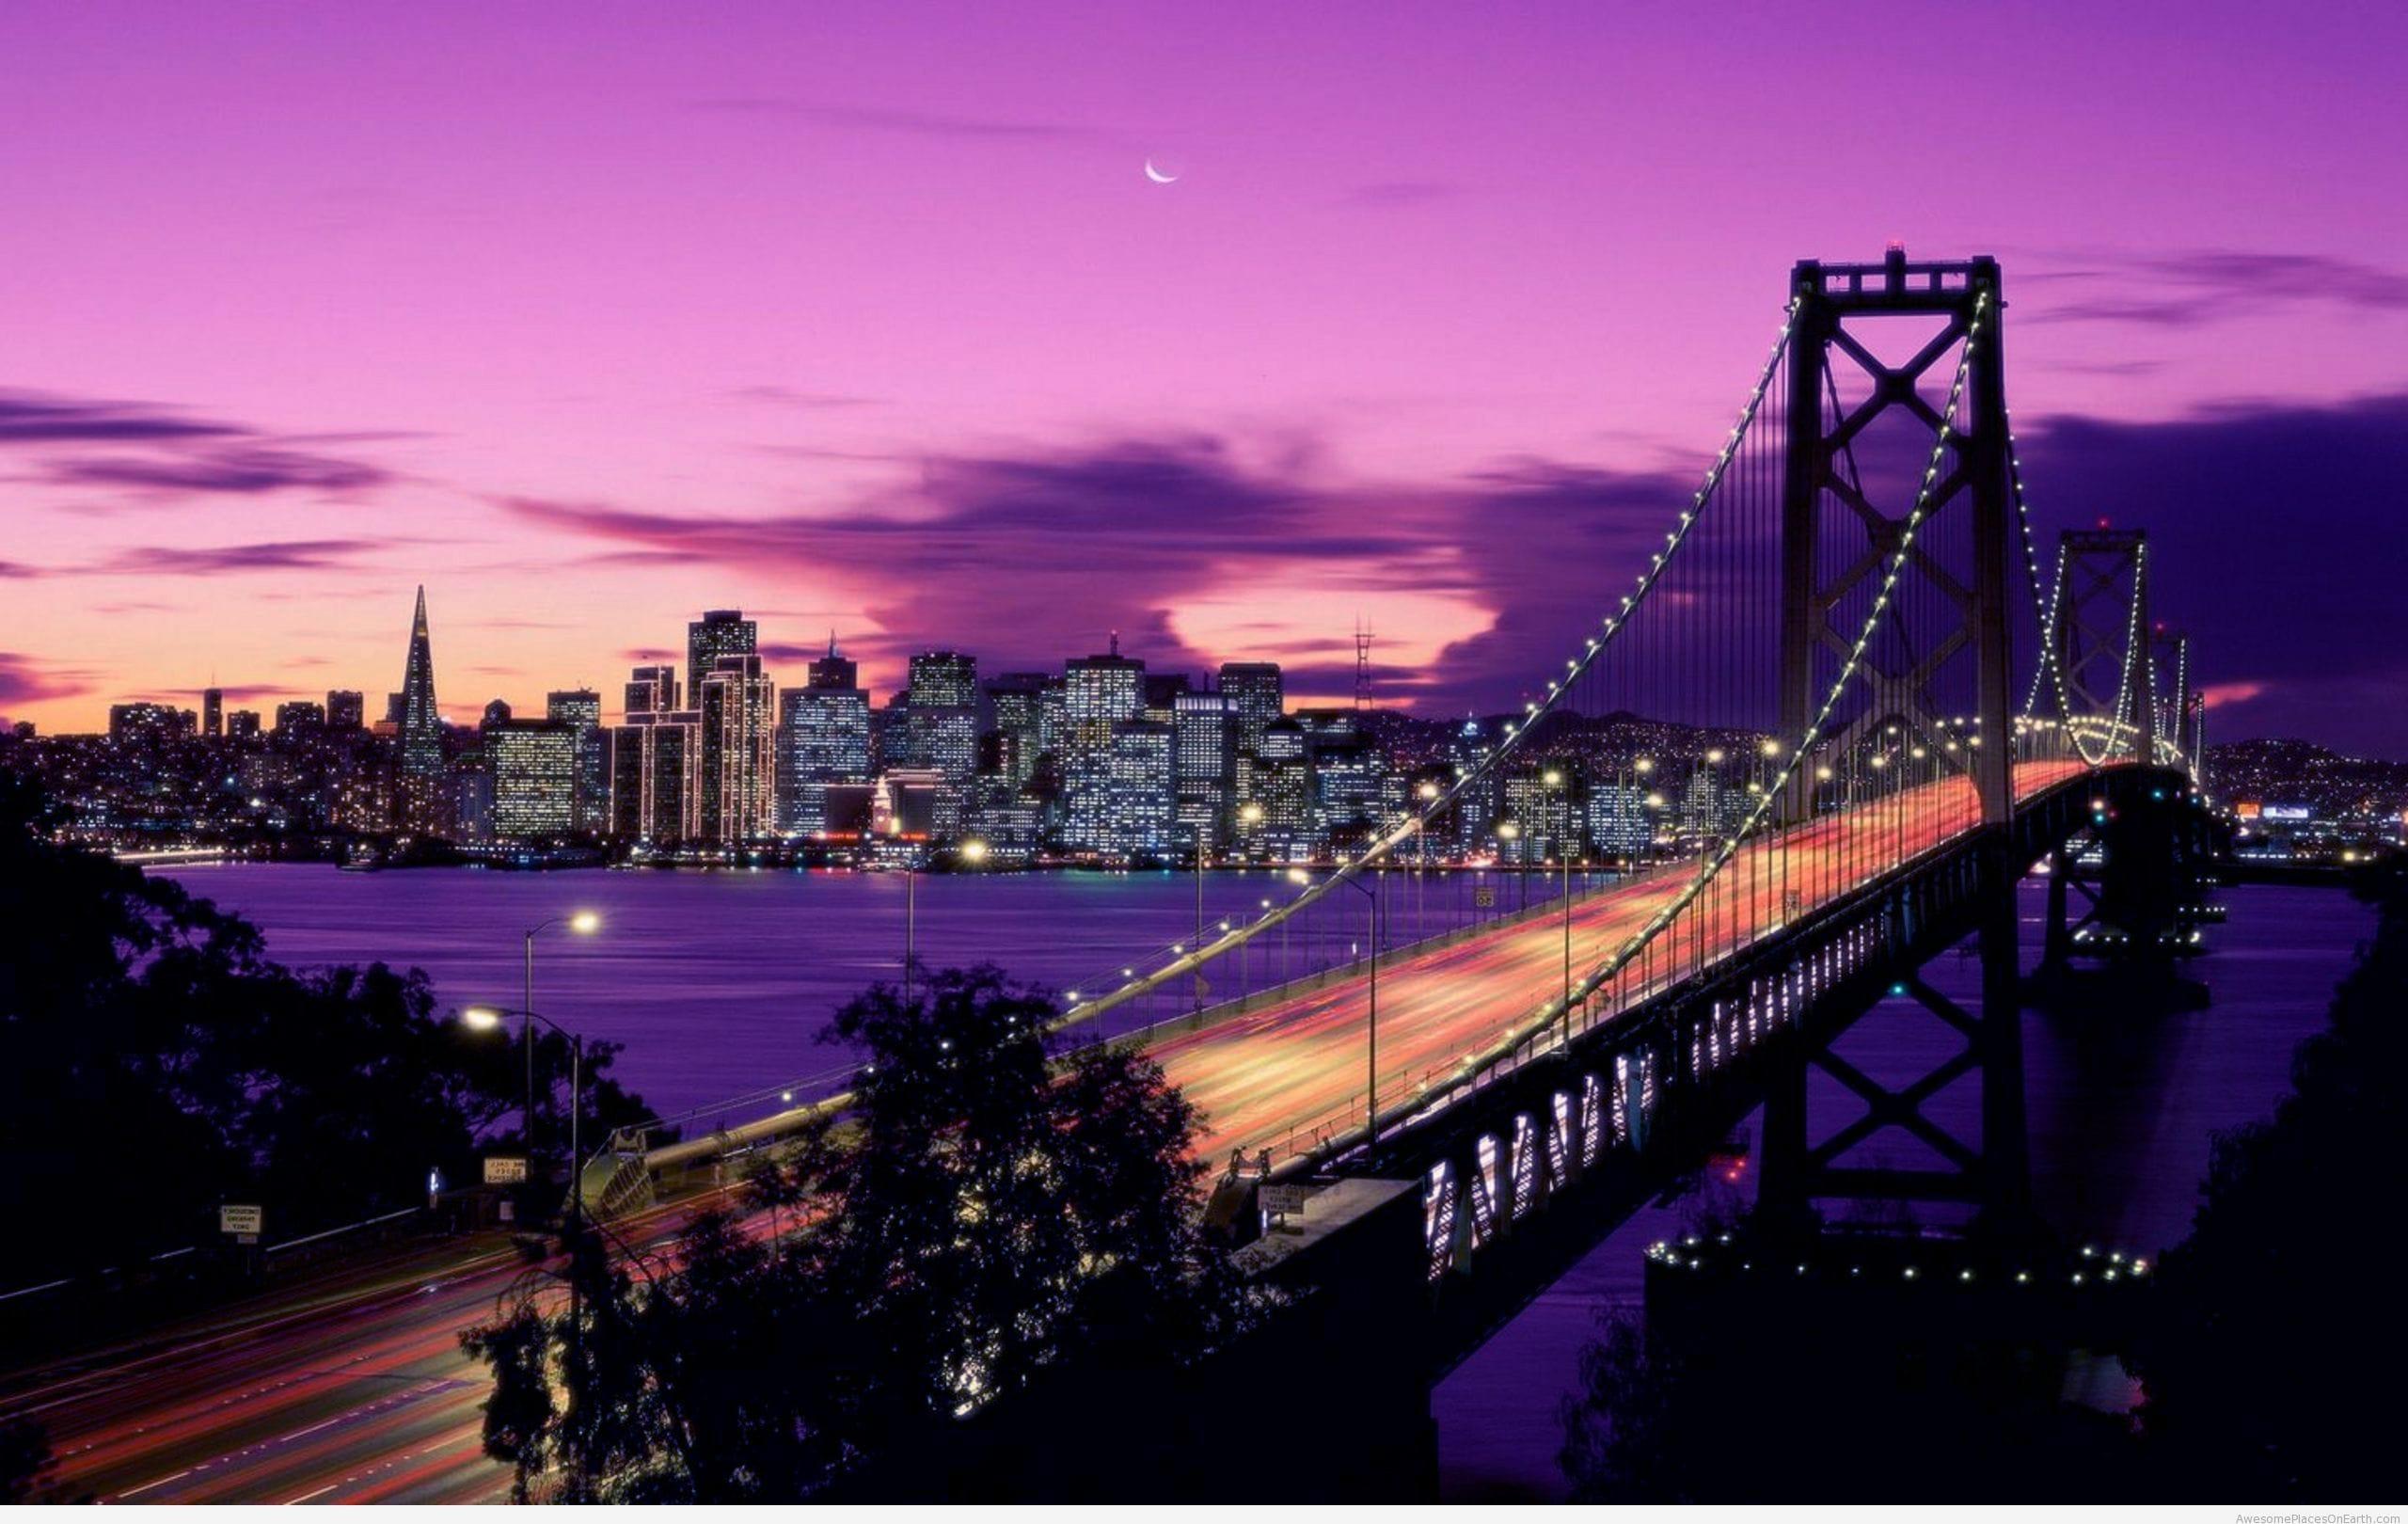 San Francisco background